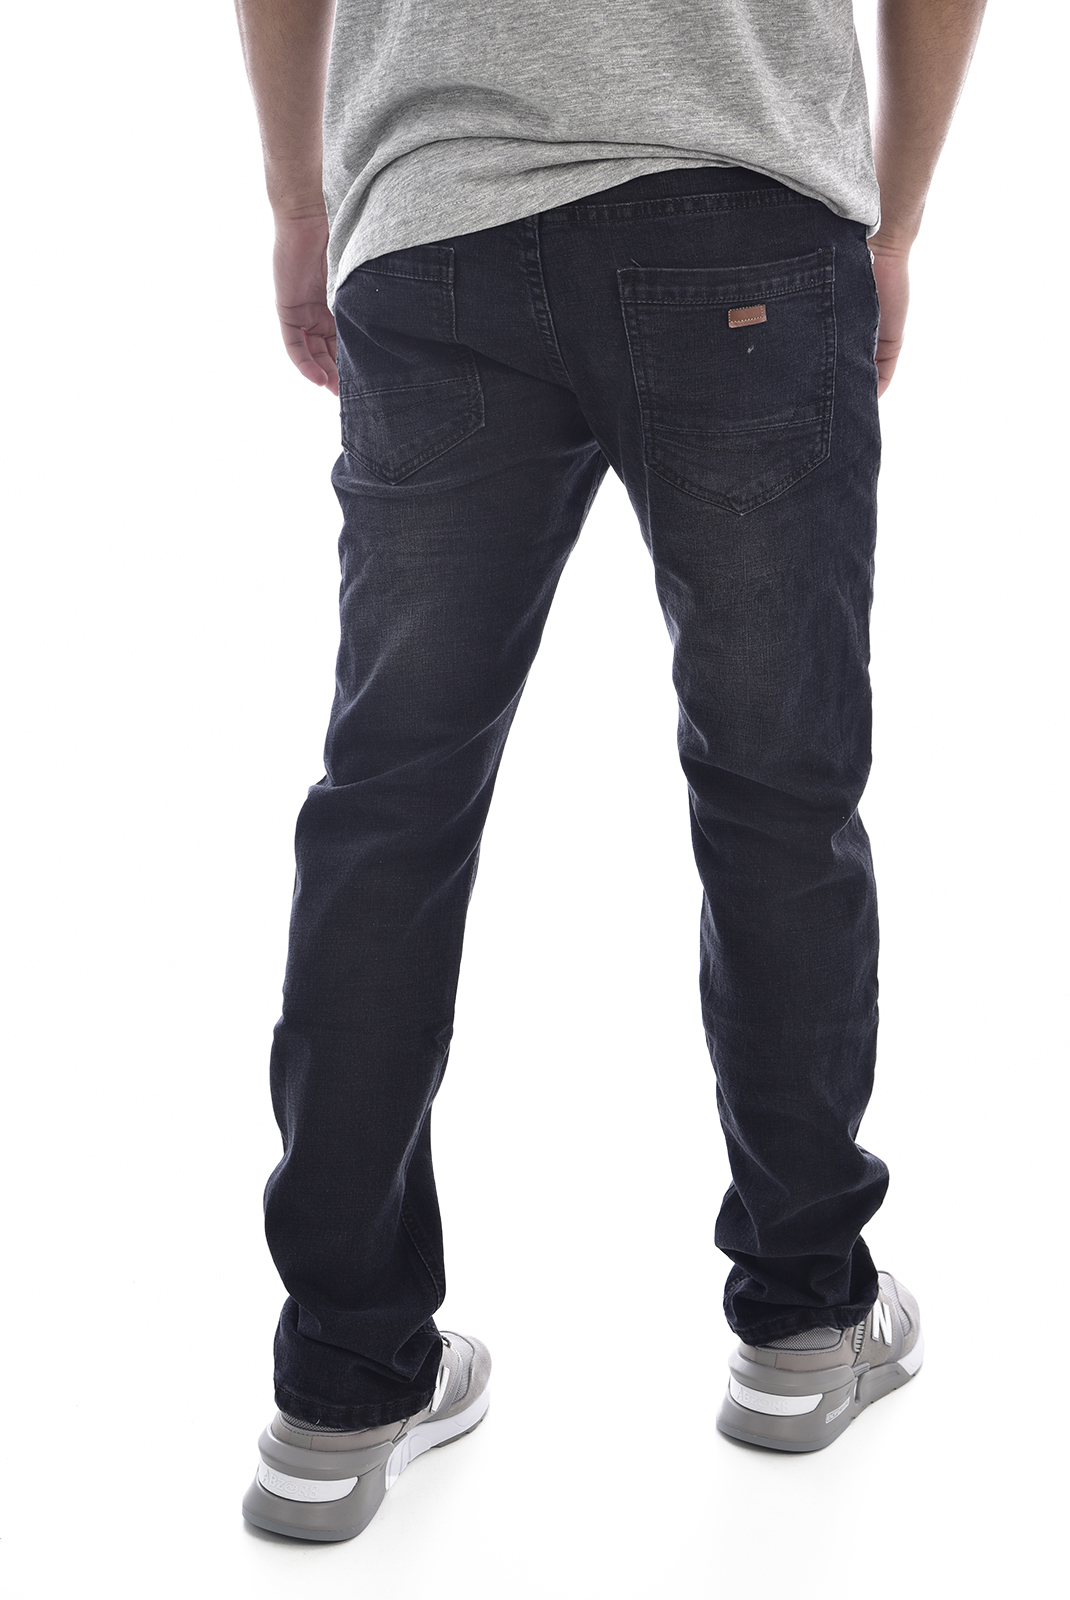 Jeans  Giani 5 C225 NOIR